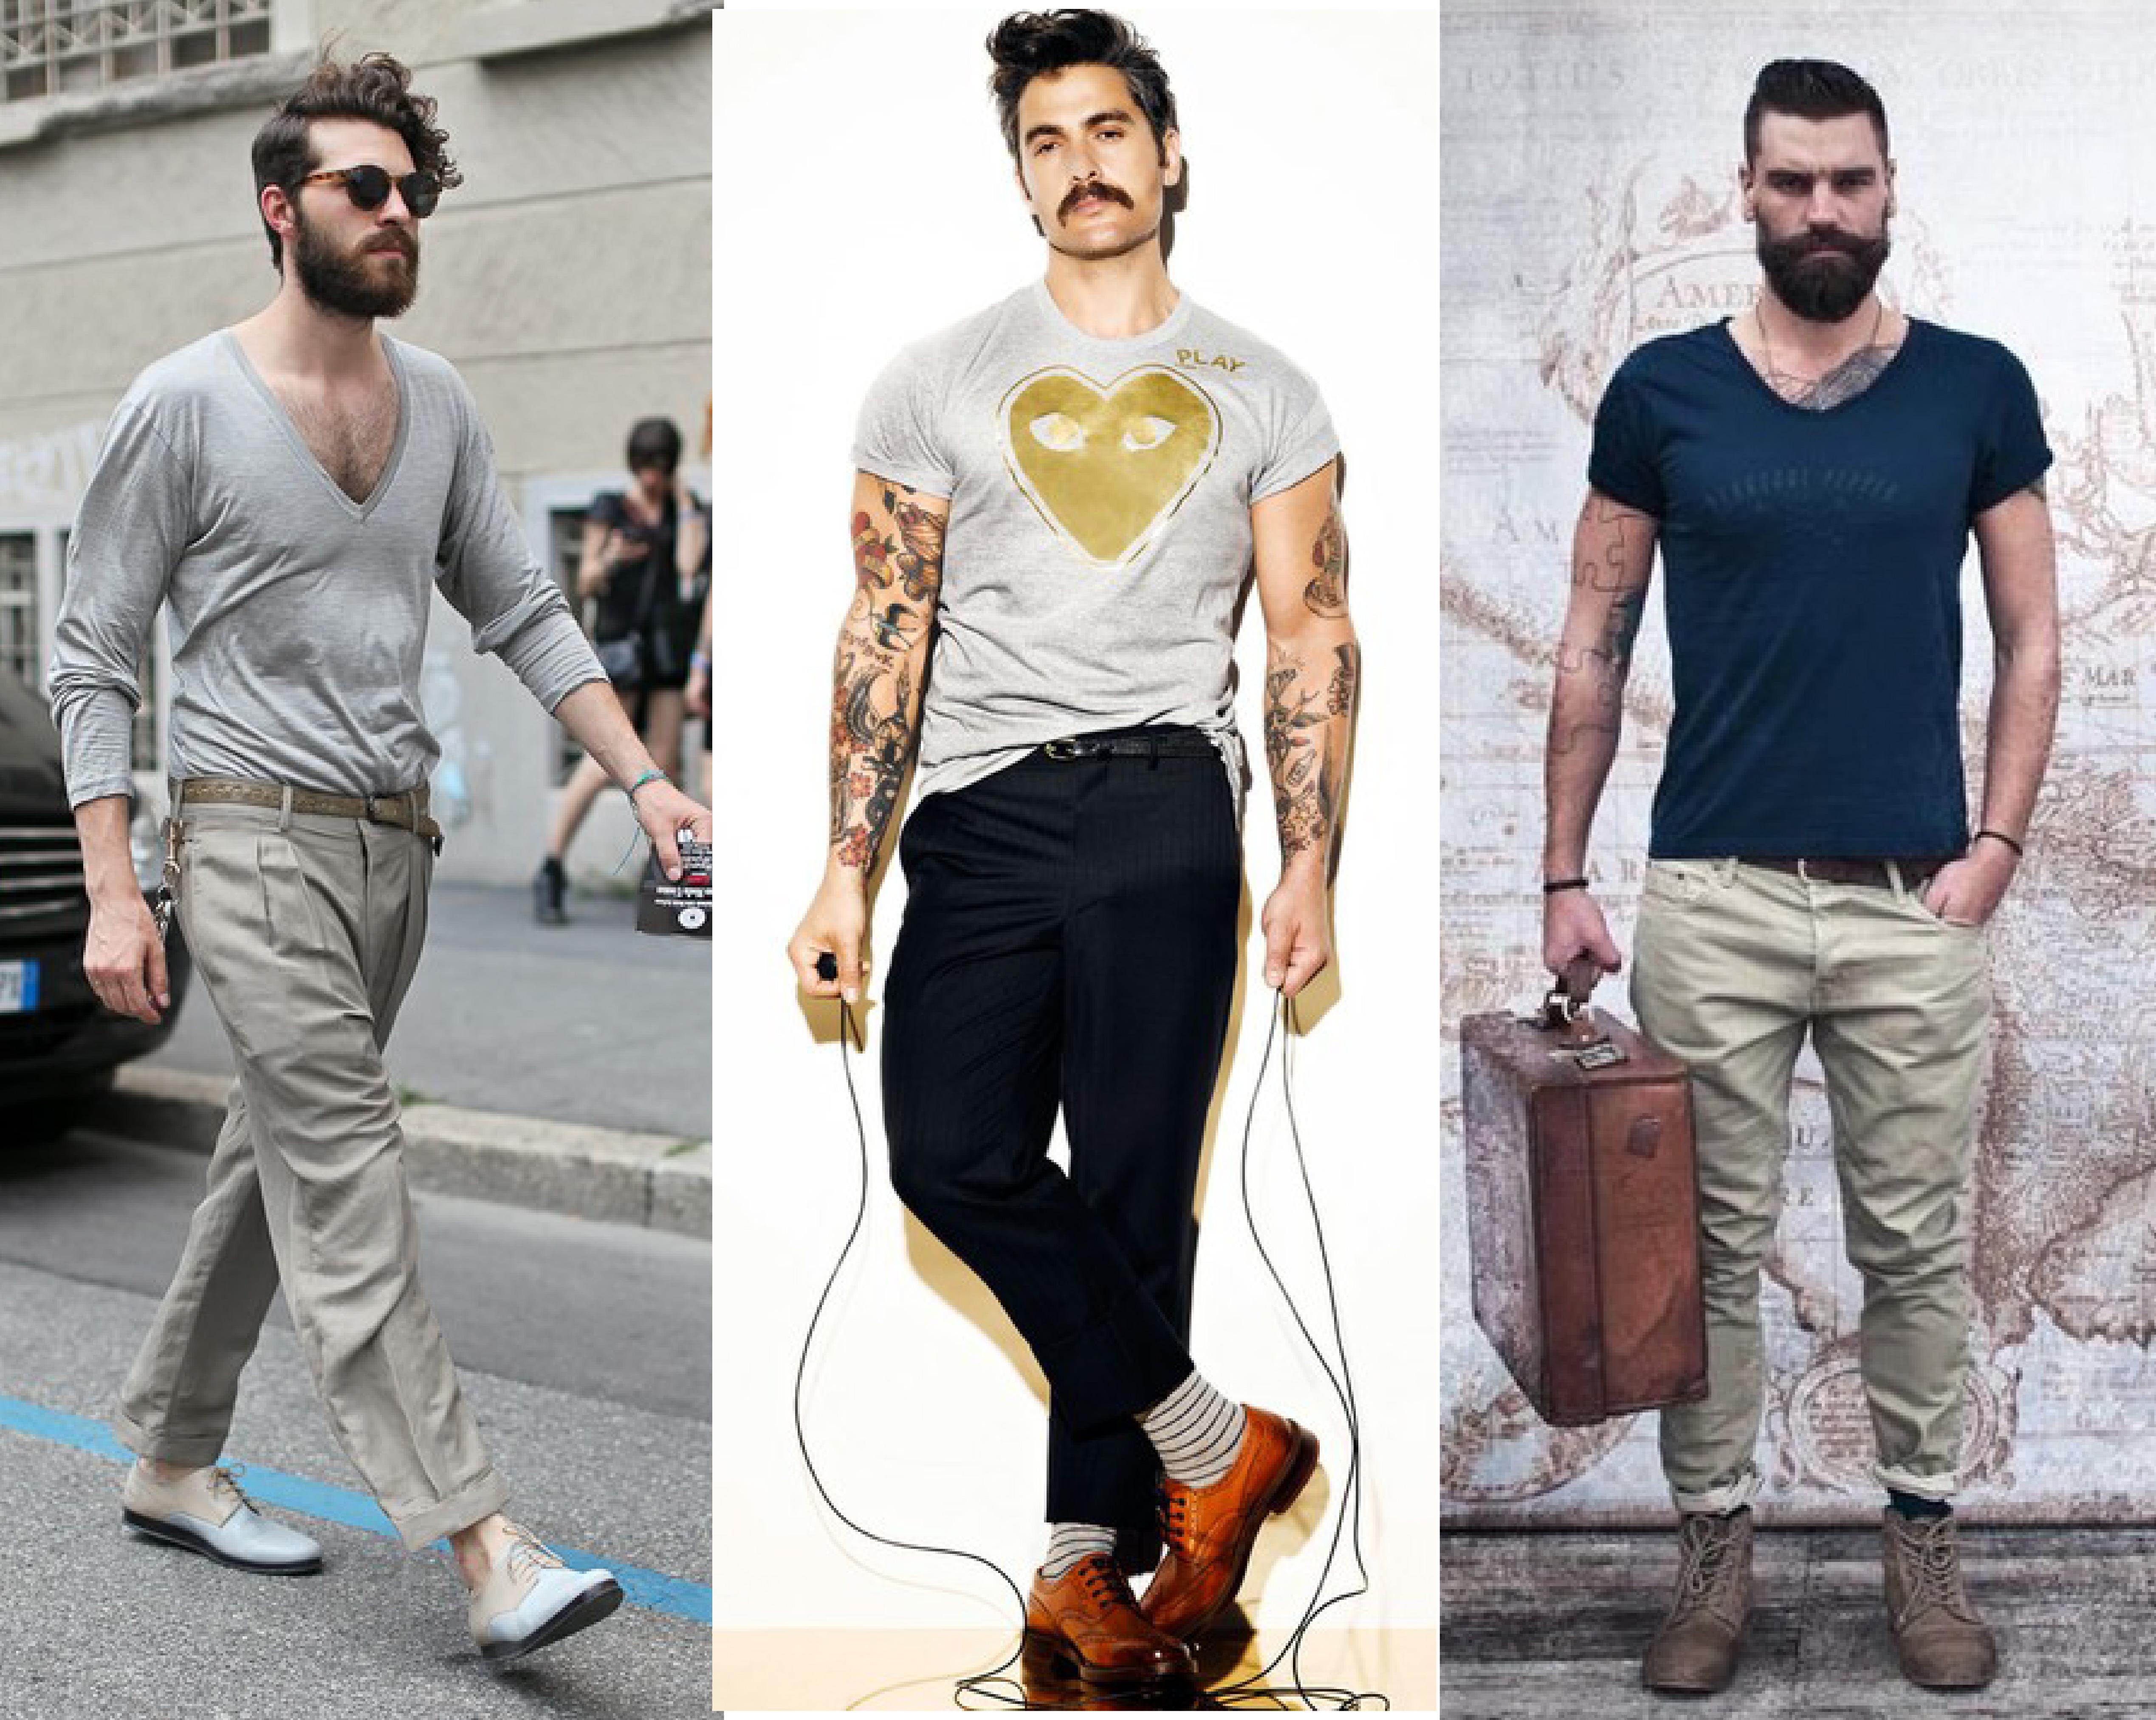 Moda barba fashion beard hipster indie look estilo style modaddiction